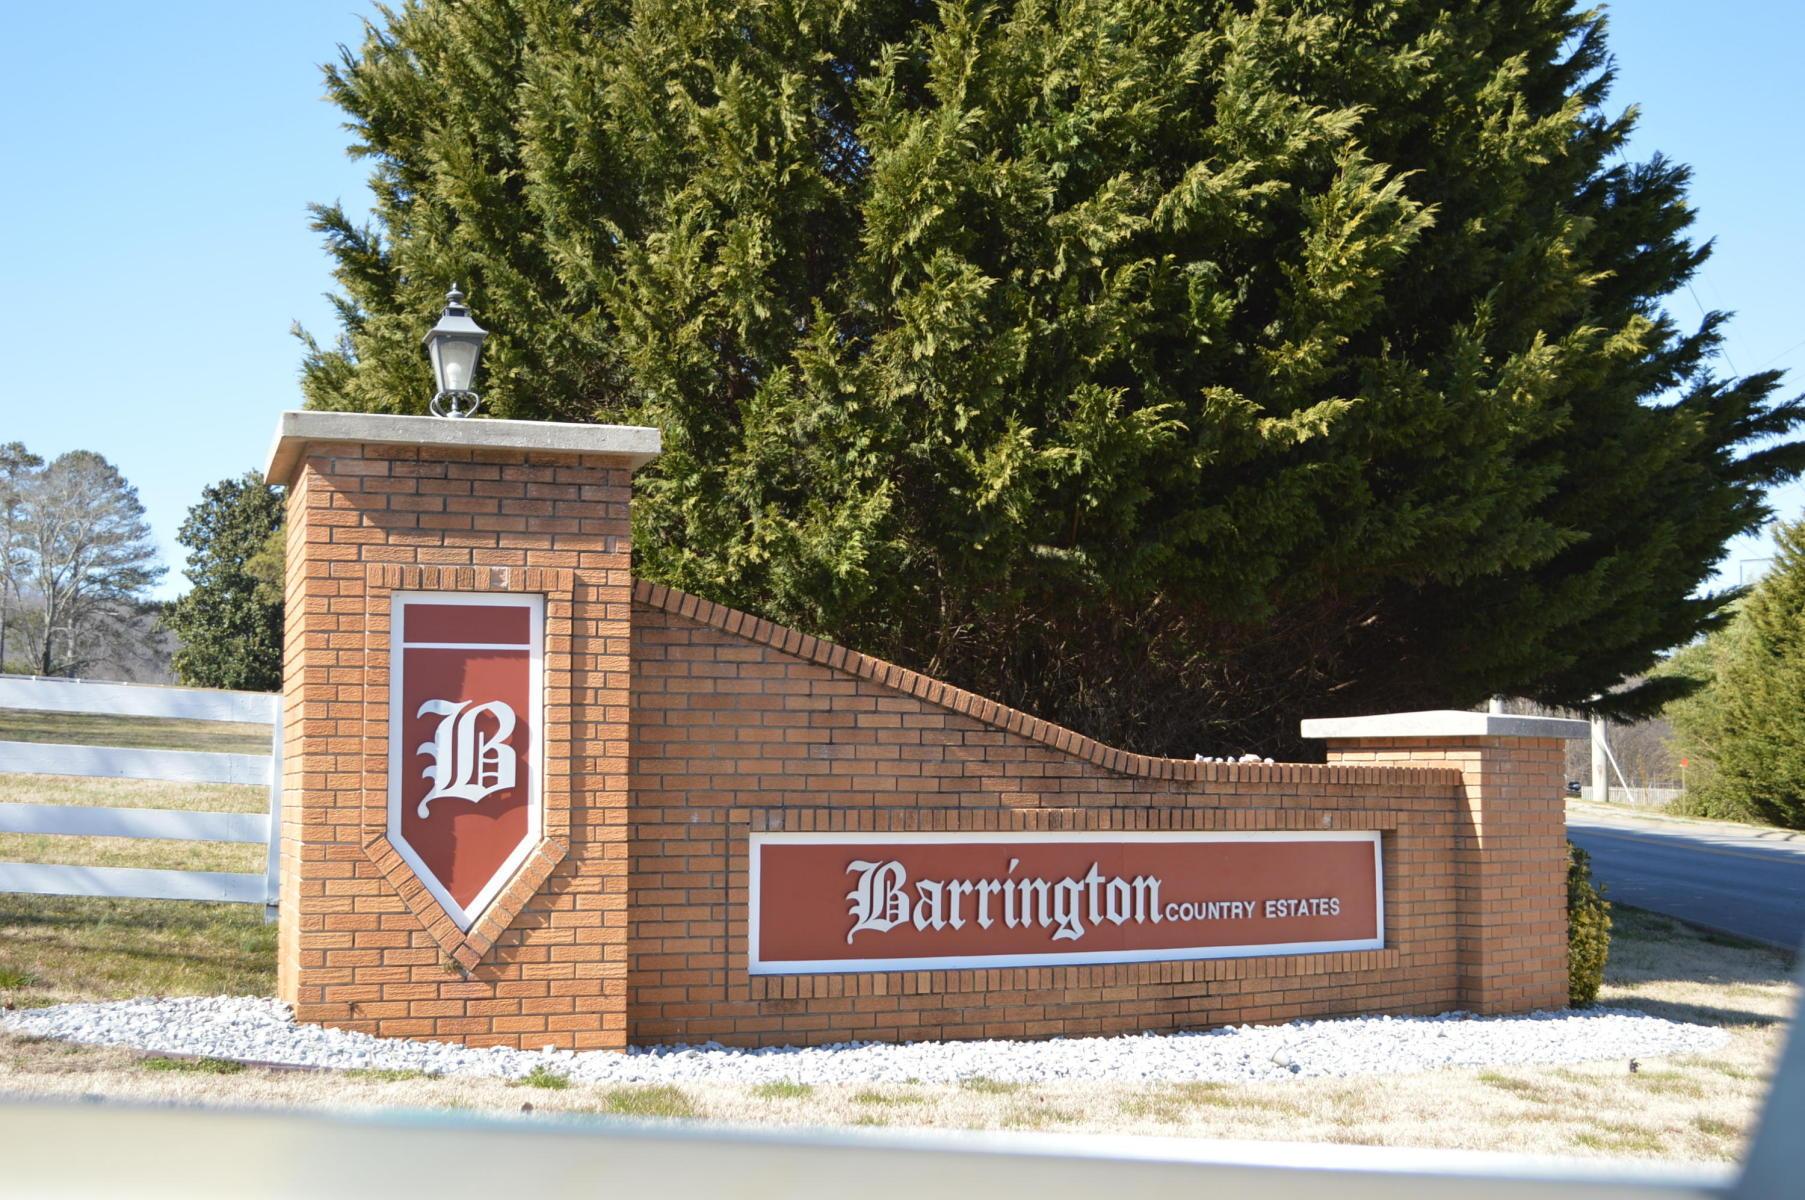 5550 Barrington Country Cir, Ooltewah, TN 37363